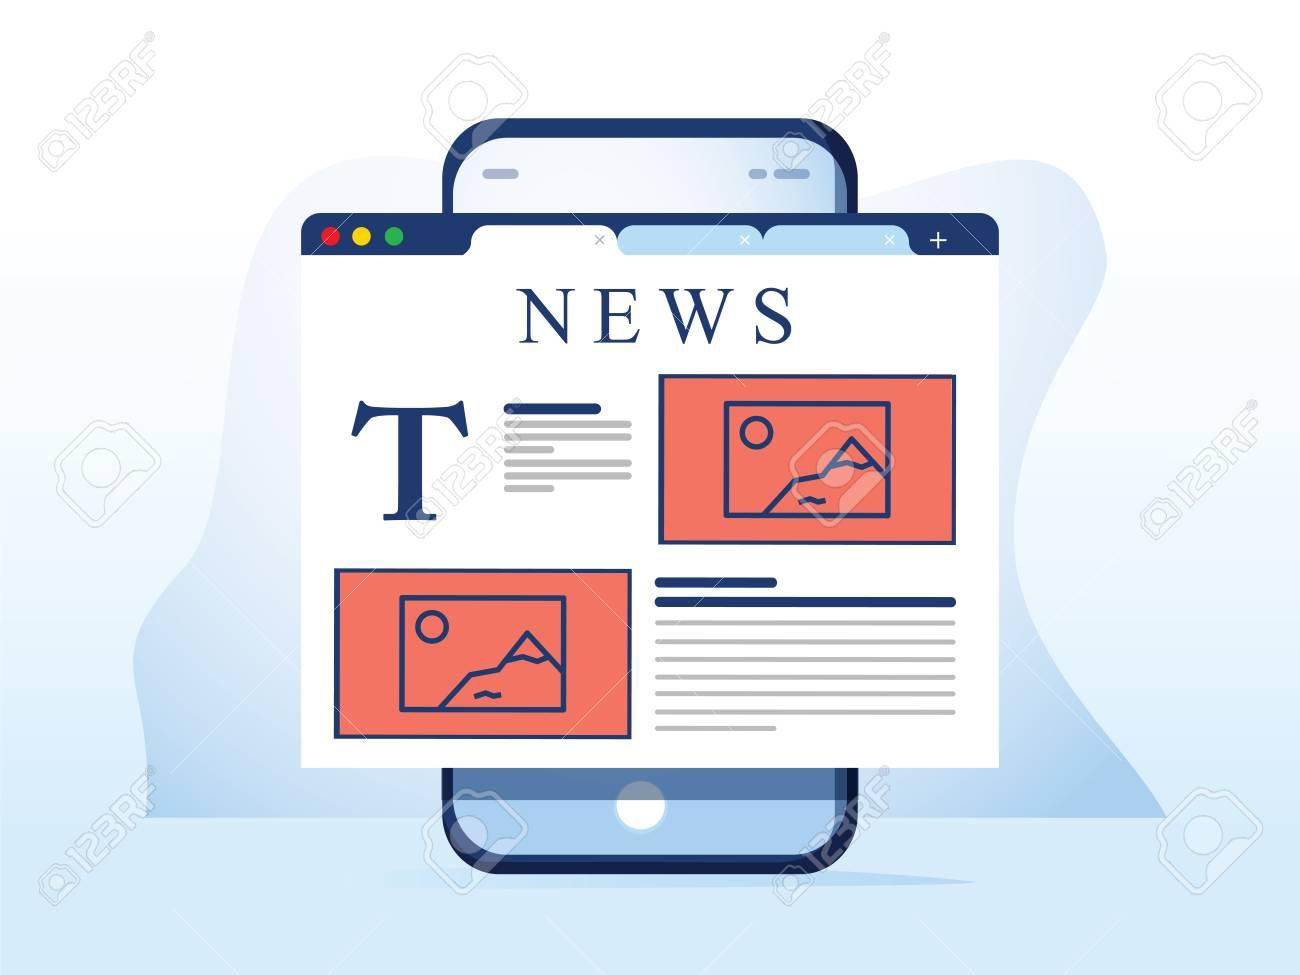 Reading news on smartphone. Online newspaper website opened in mobile browser on smart phone. News app, online media. Modern flat design. Vector illustration. Breaking news web design app on the phone - 127716639